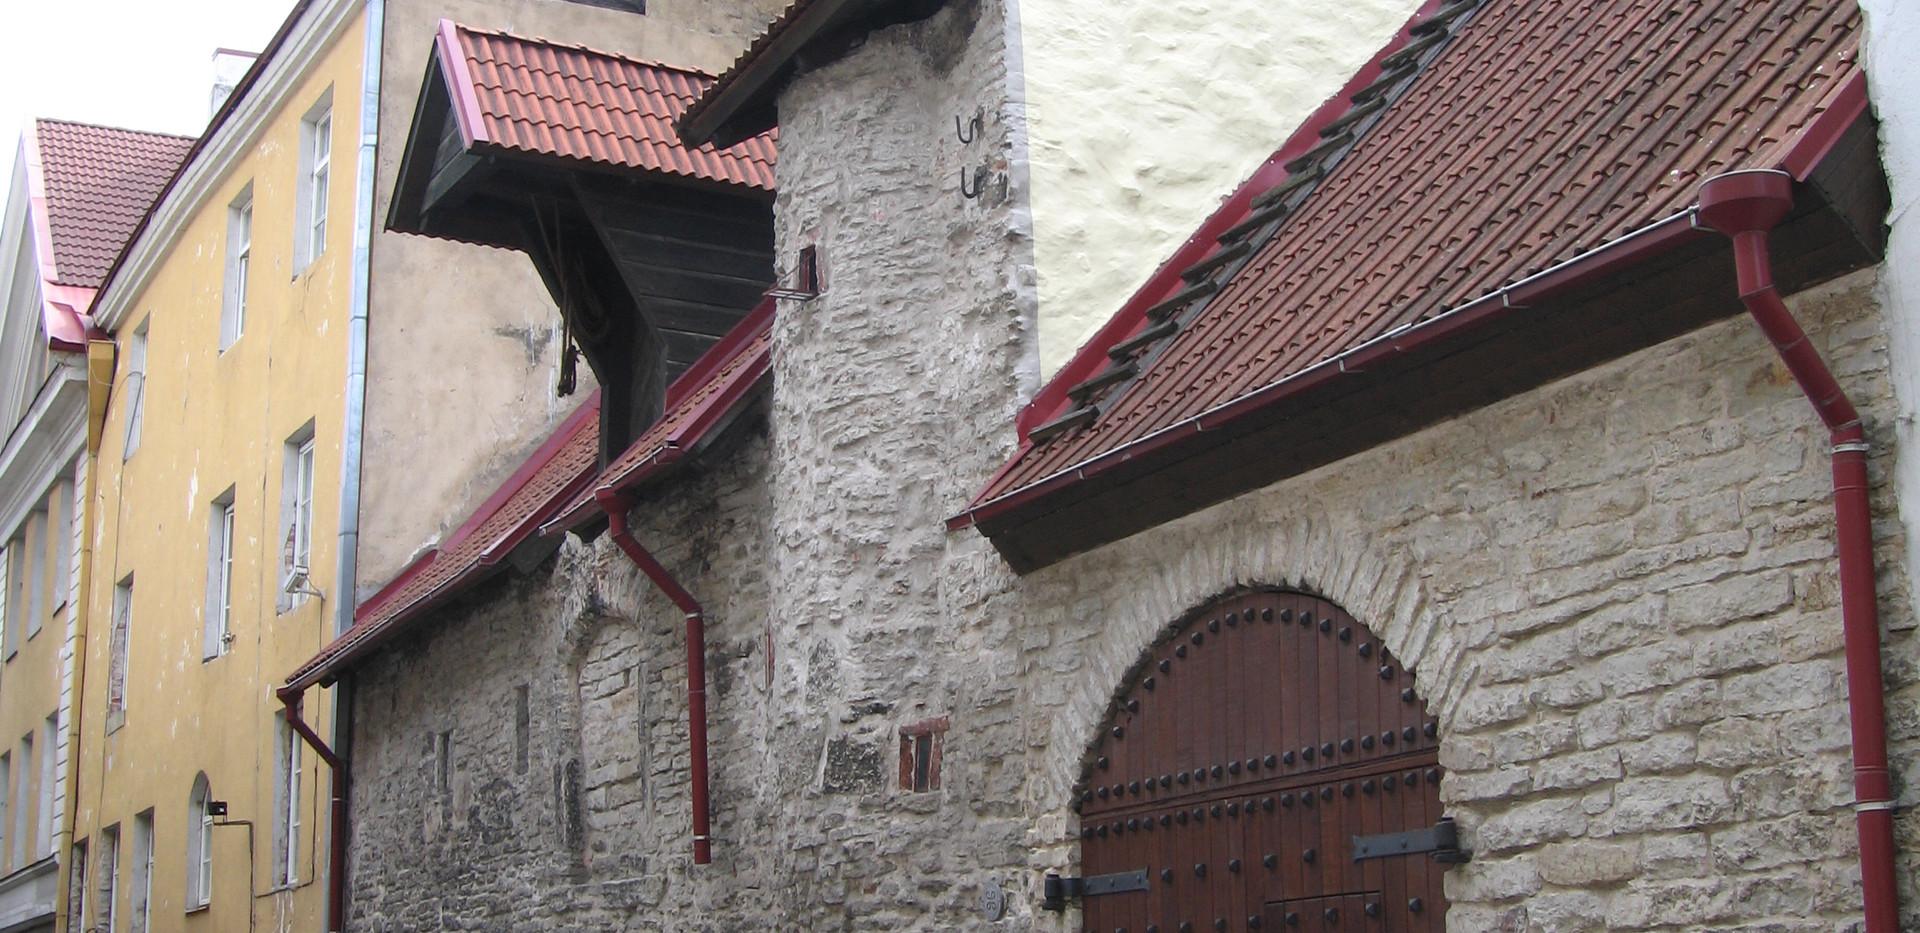 09 Tallinn УГКЦ.jpg